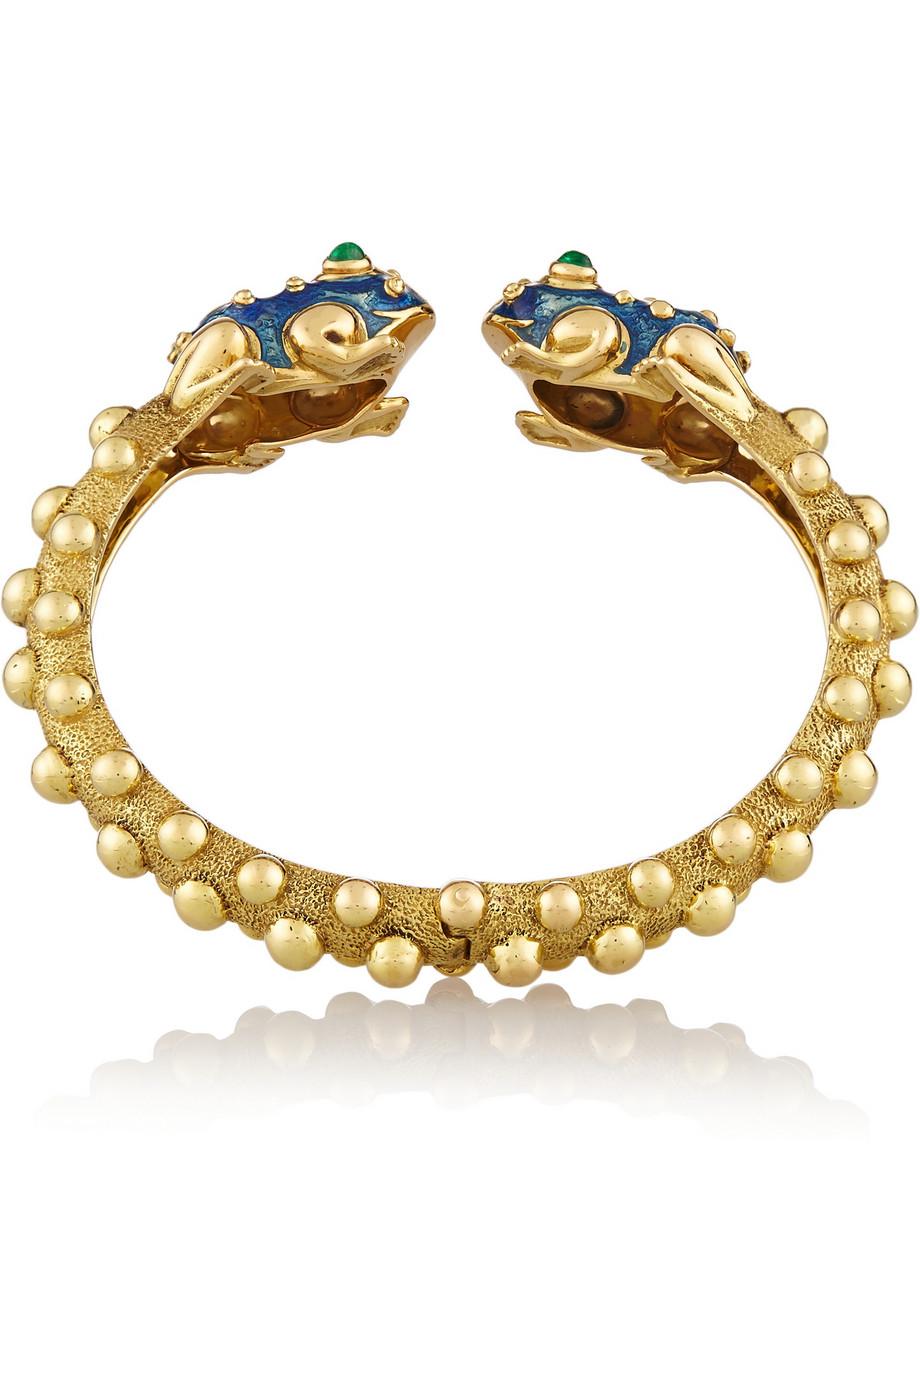 David Webb 18k Gold Baby Frog Cuff Bracelet in Black Enamel j4txB